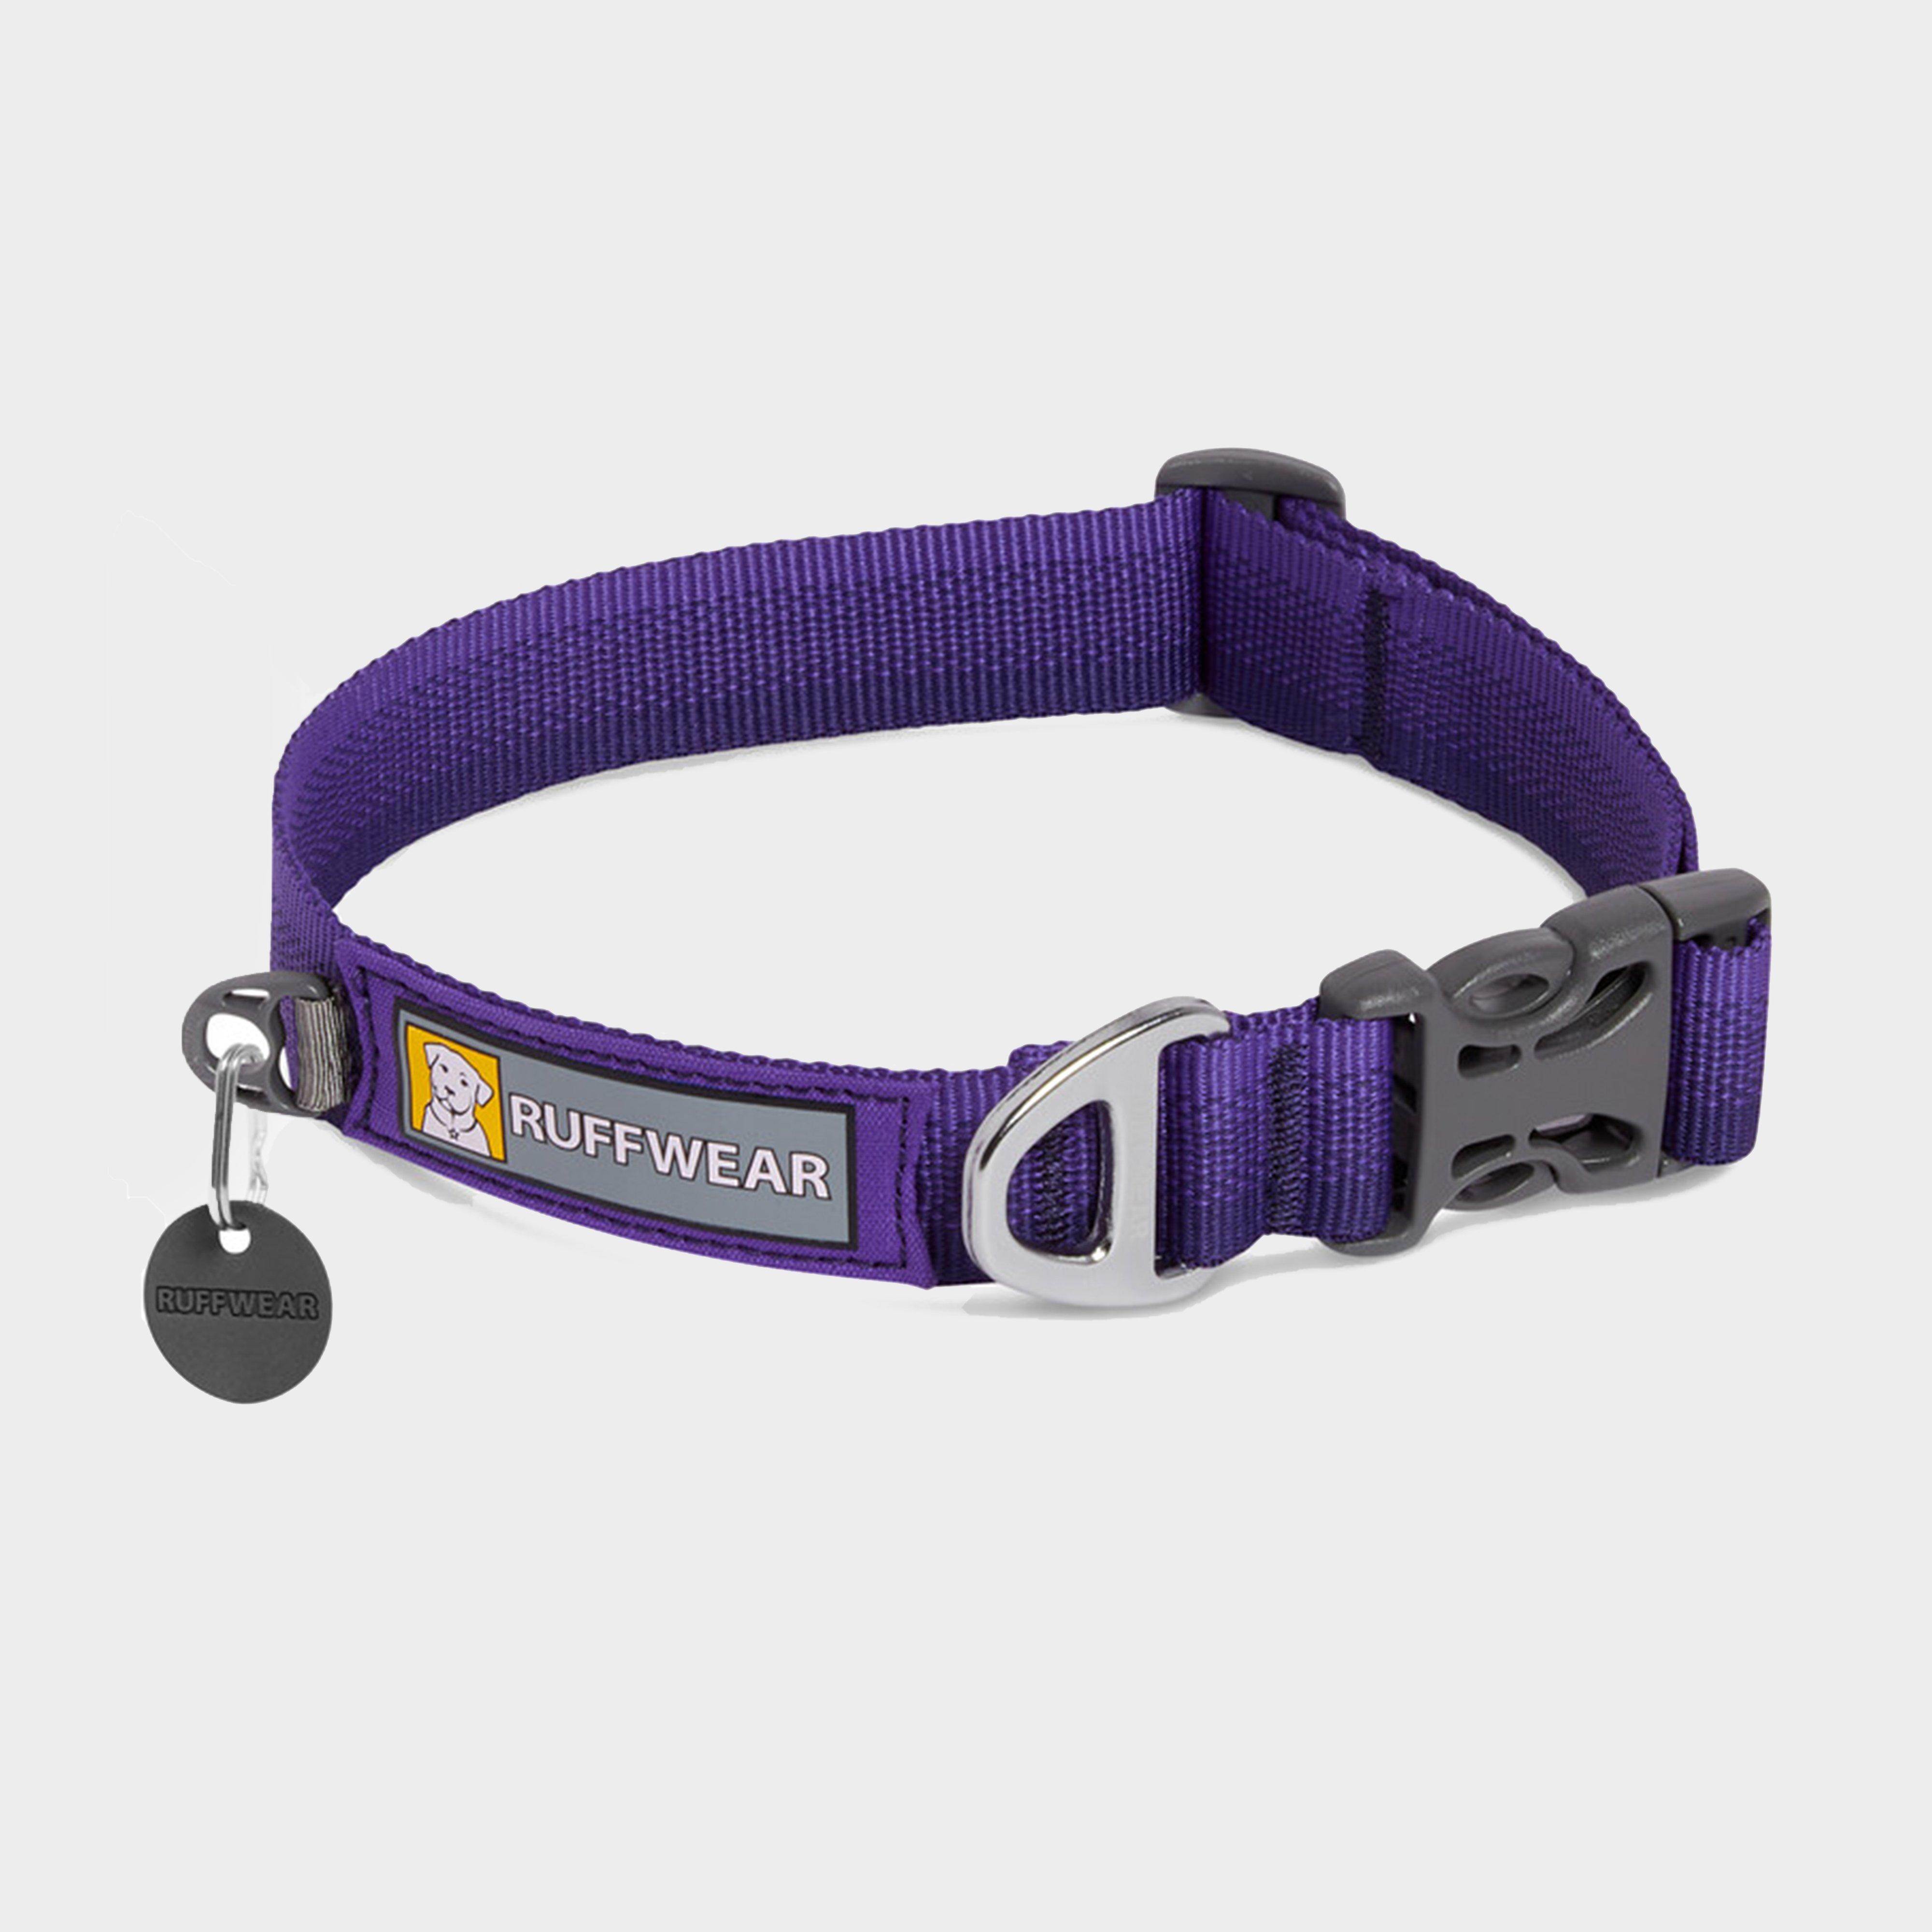 Image of Ruffwear Front Range Dog Collar - Purple/Mbl, Purple/MBL